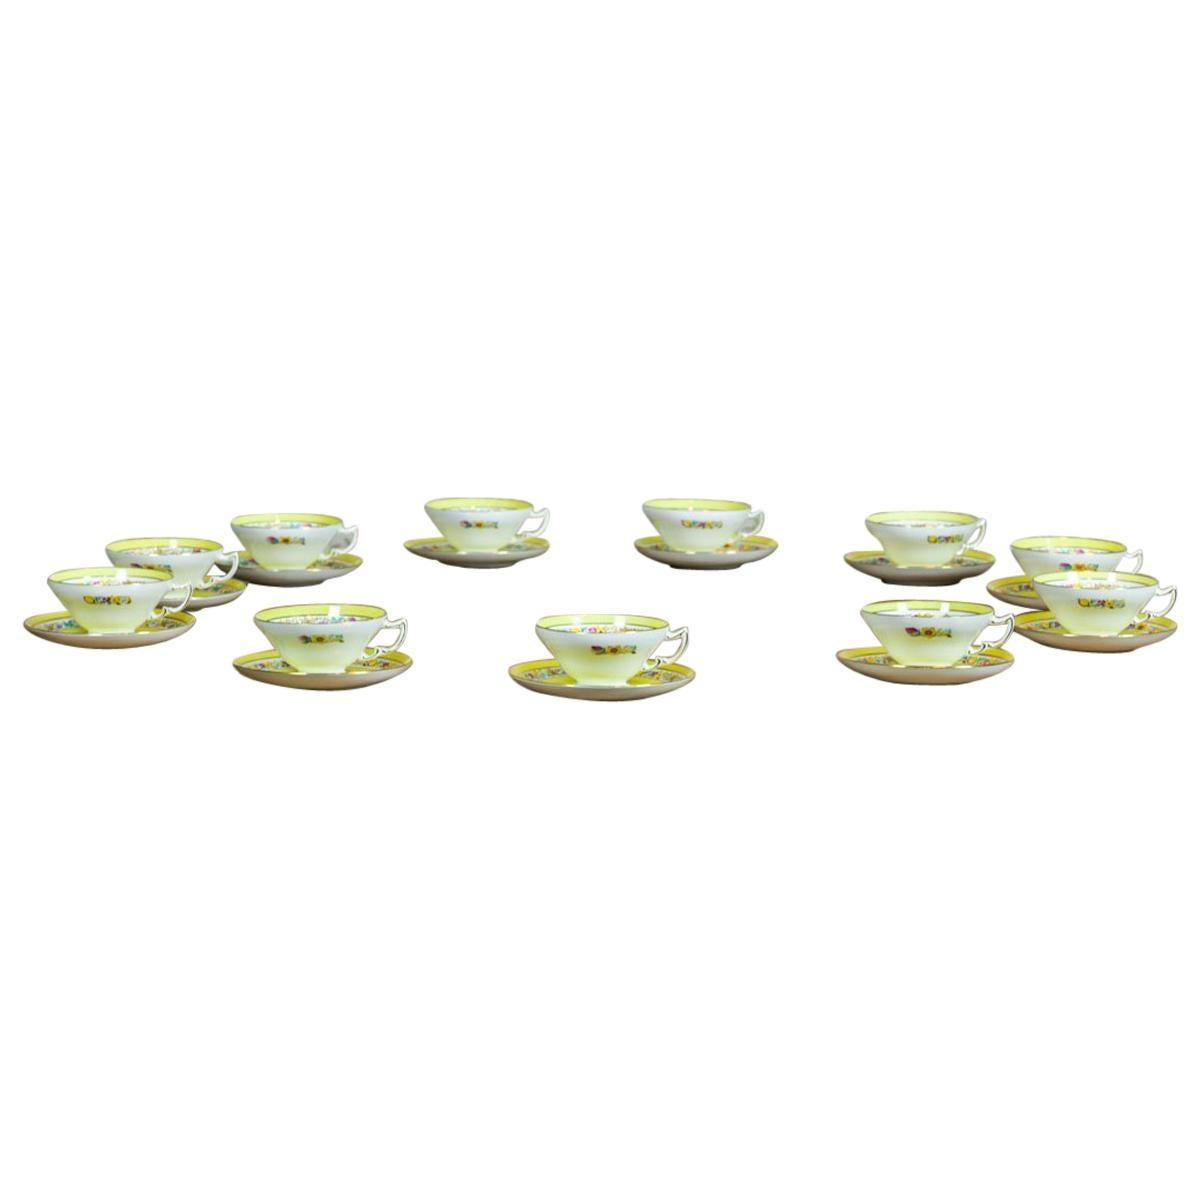 Set of English Mintons Cups, circa 1929